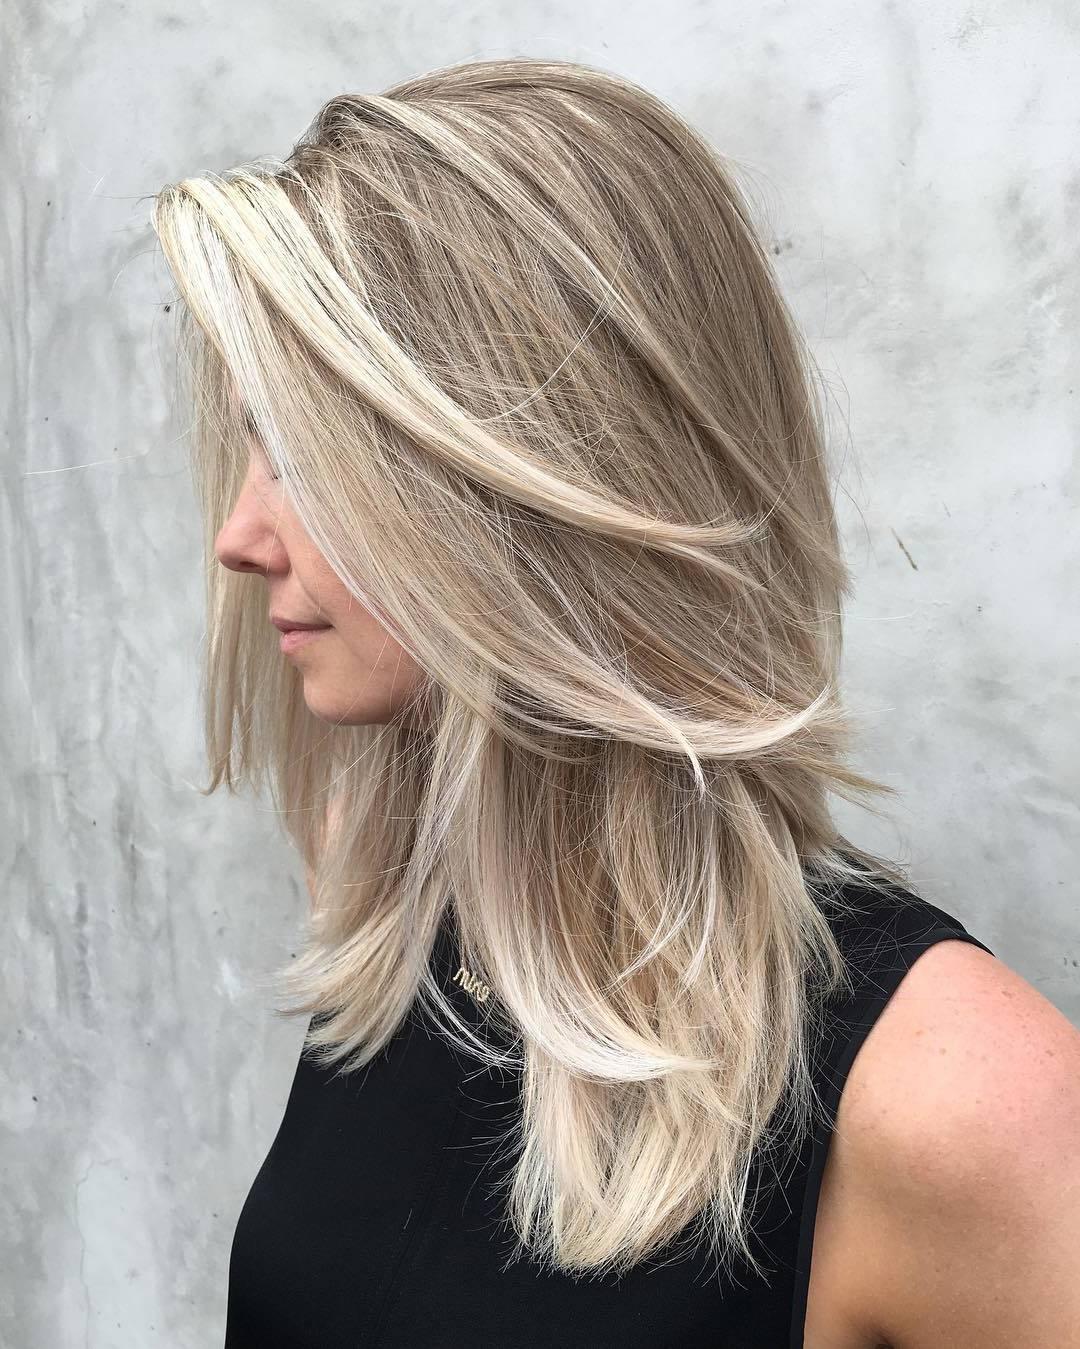 Tipps zu hellblonden Haaren